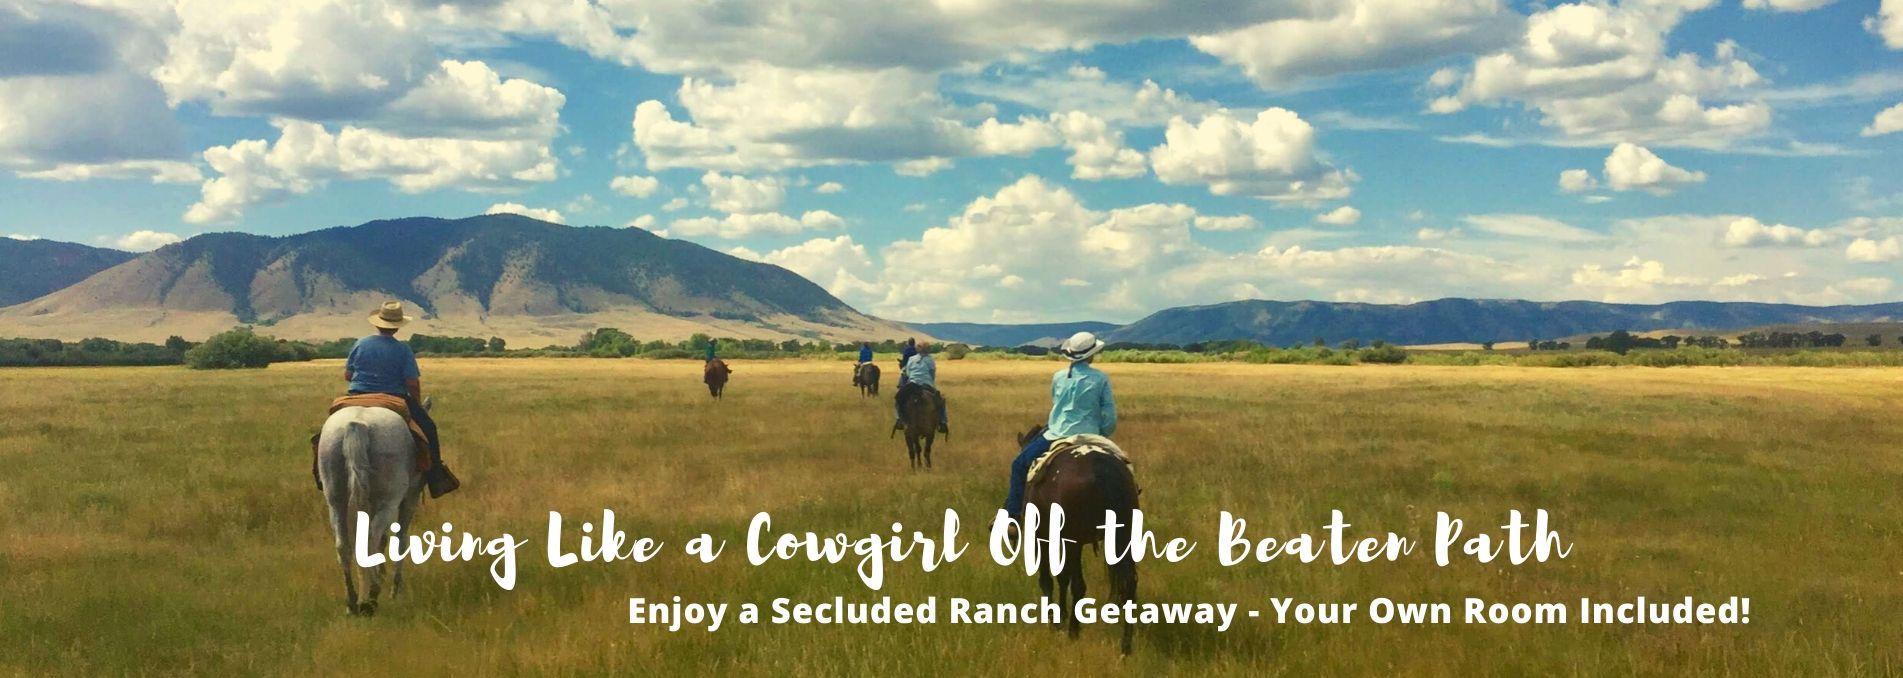 Enjoy a Secluded Ranch Getaway